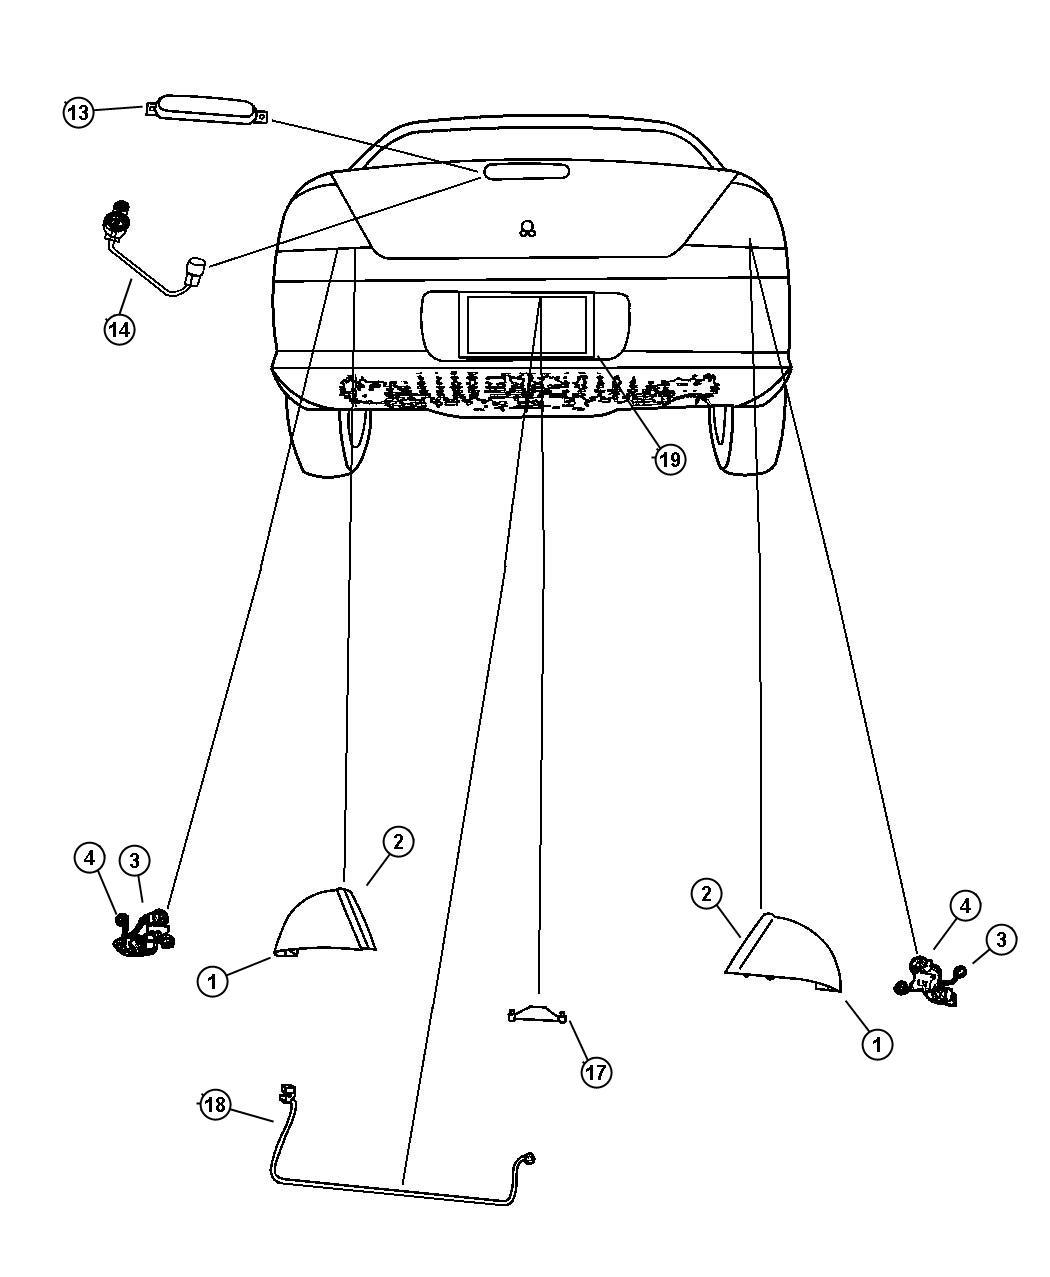 2005 dodge stratus radio wiring